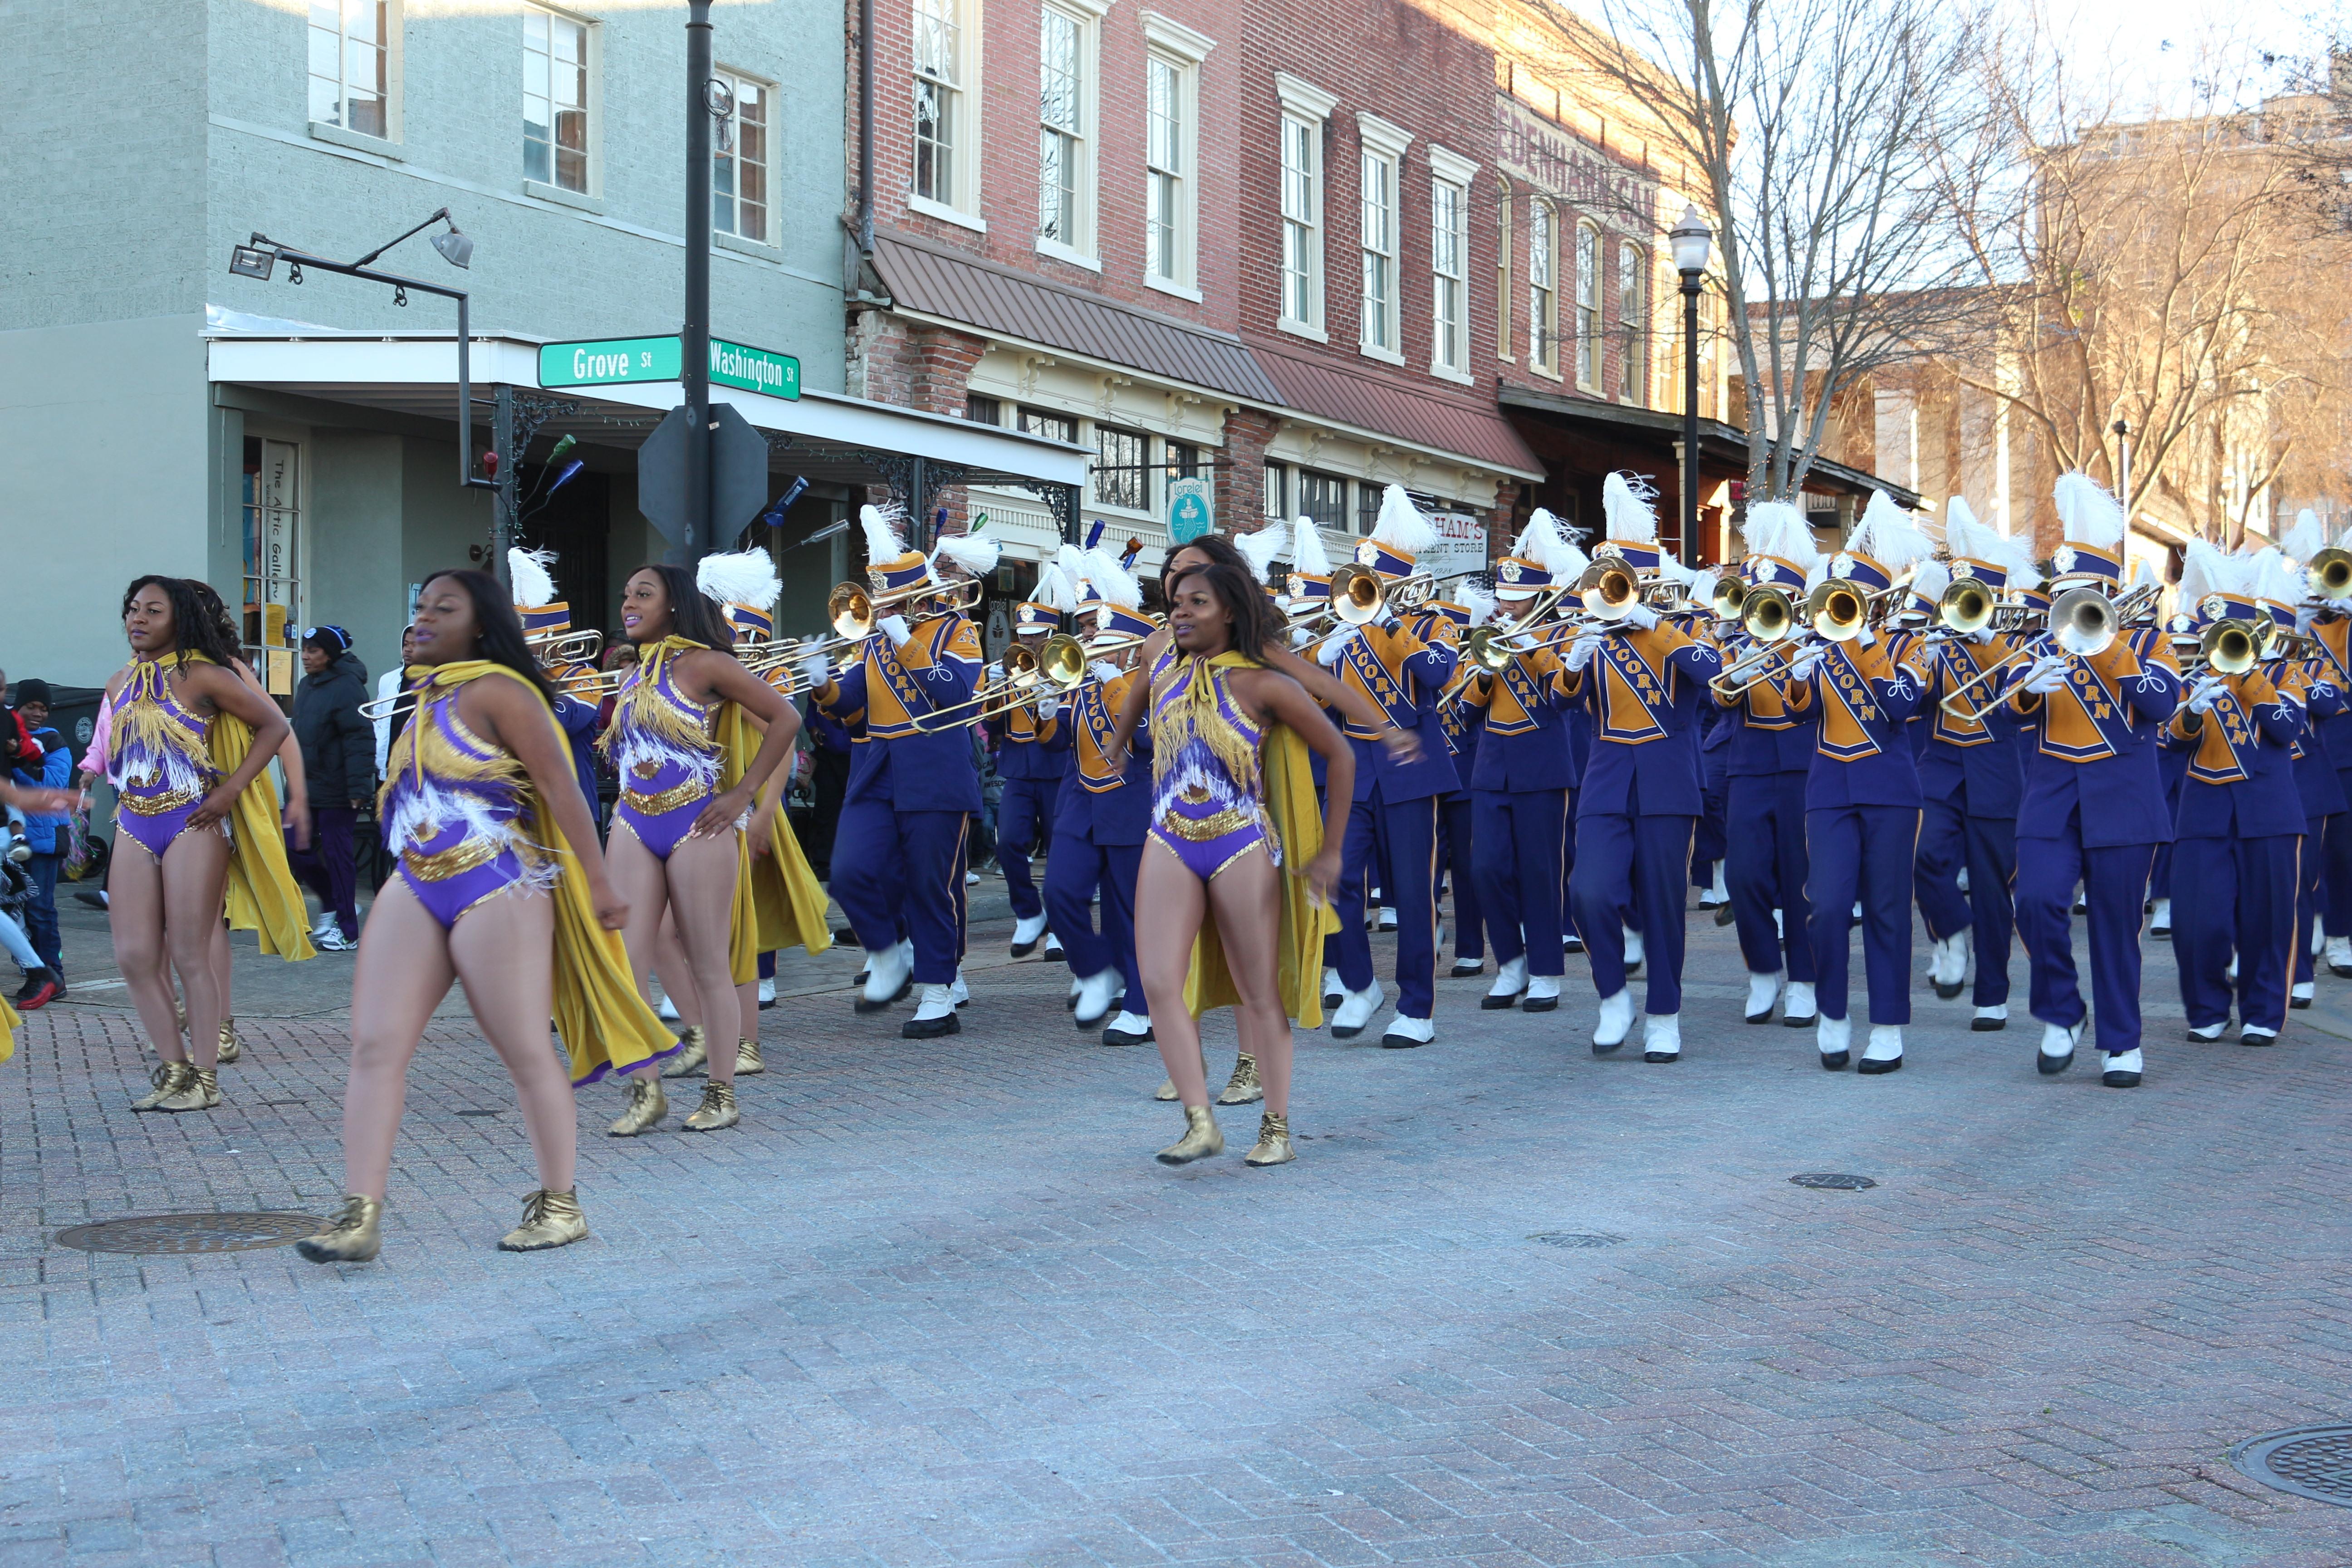 ASU Celebrates the 2019 SWAC Championship with Parade